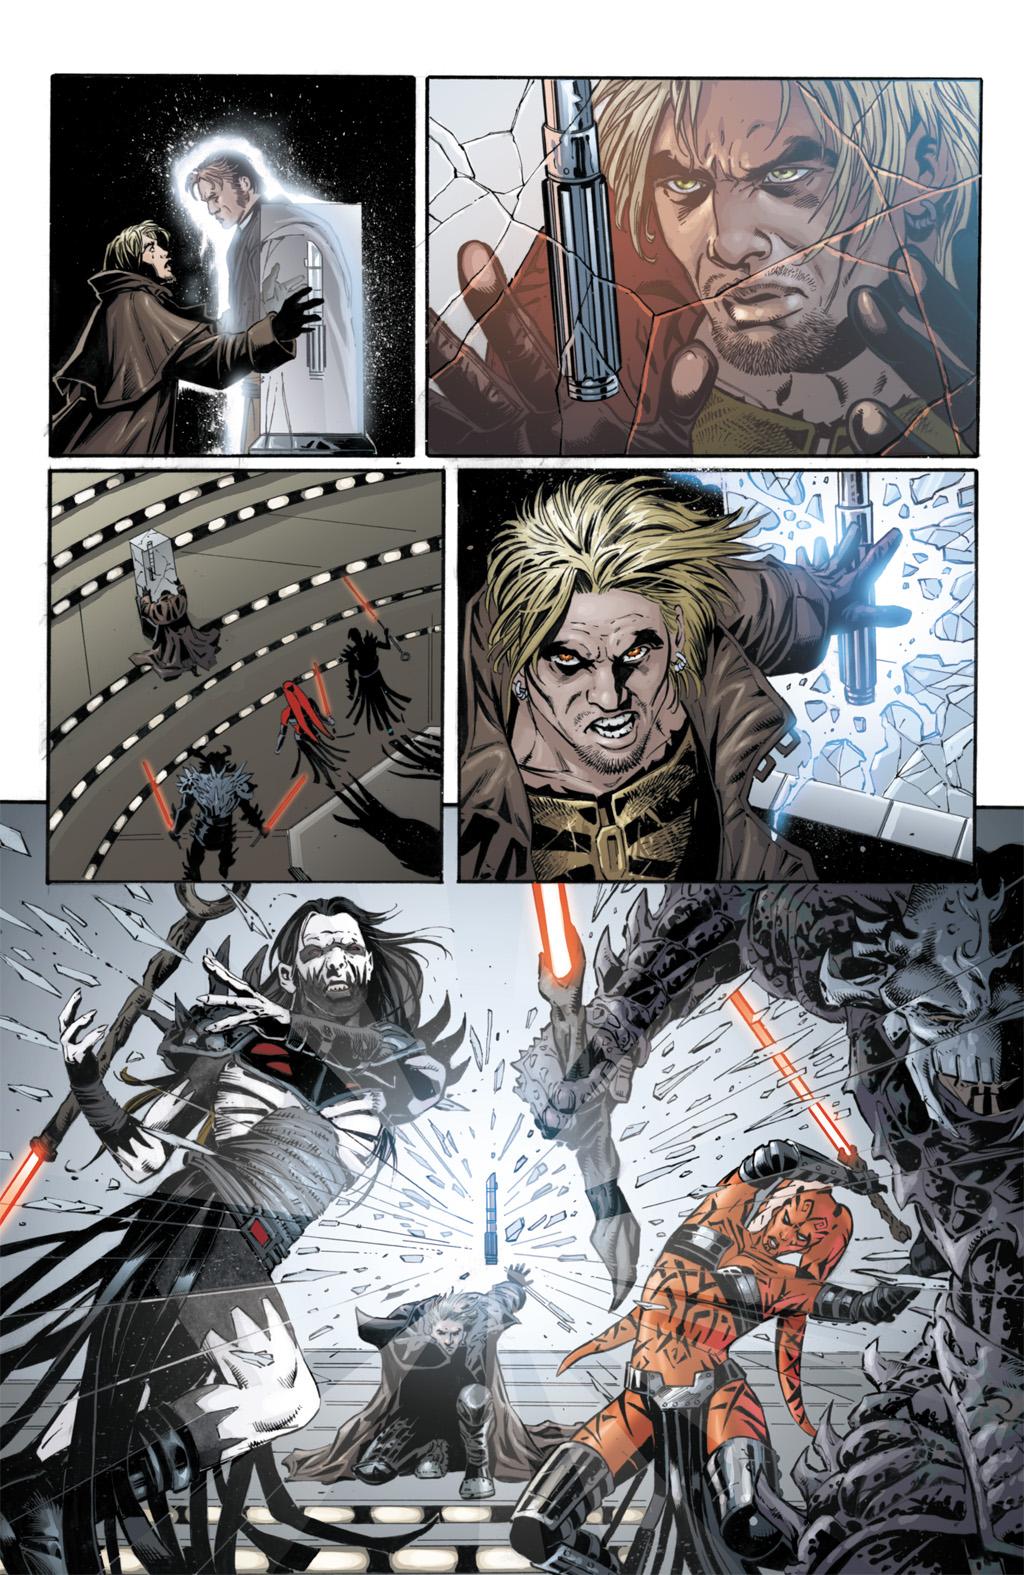 Comic-Only Fights Adapted To Novel Format UB3TF2fh0bIRnQNaYu-RPvAPTzsZRCUU7yQt8RFhiiK1oLKi1aCpm4GvupCXB5ESiMa4c6NBJDtT=s1600